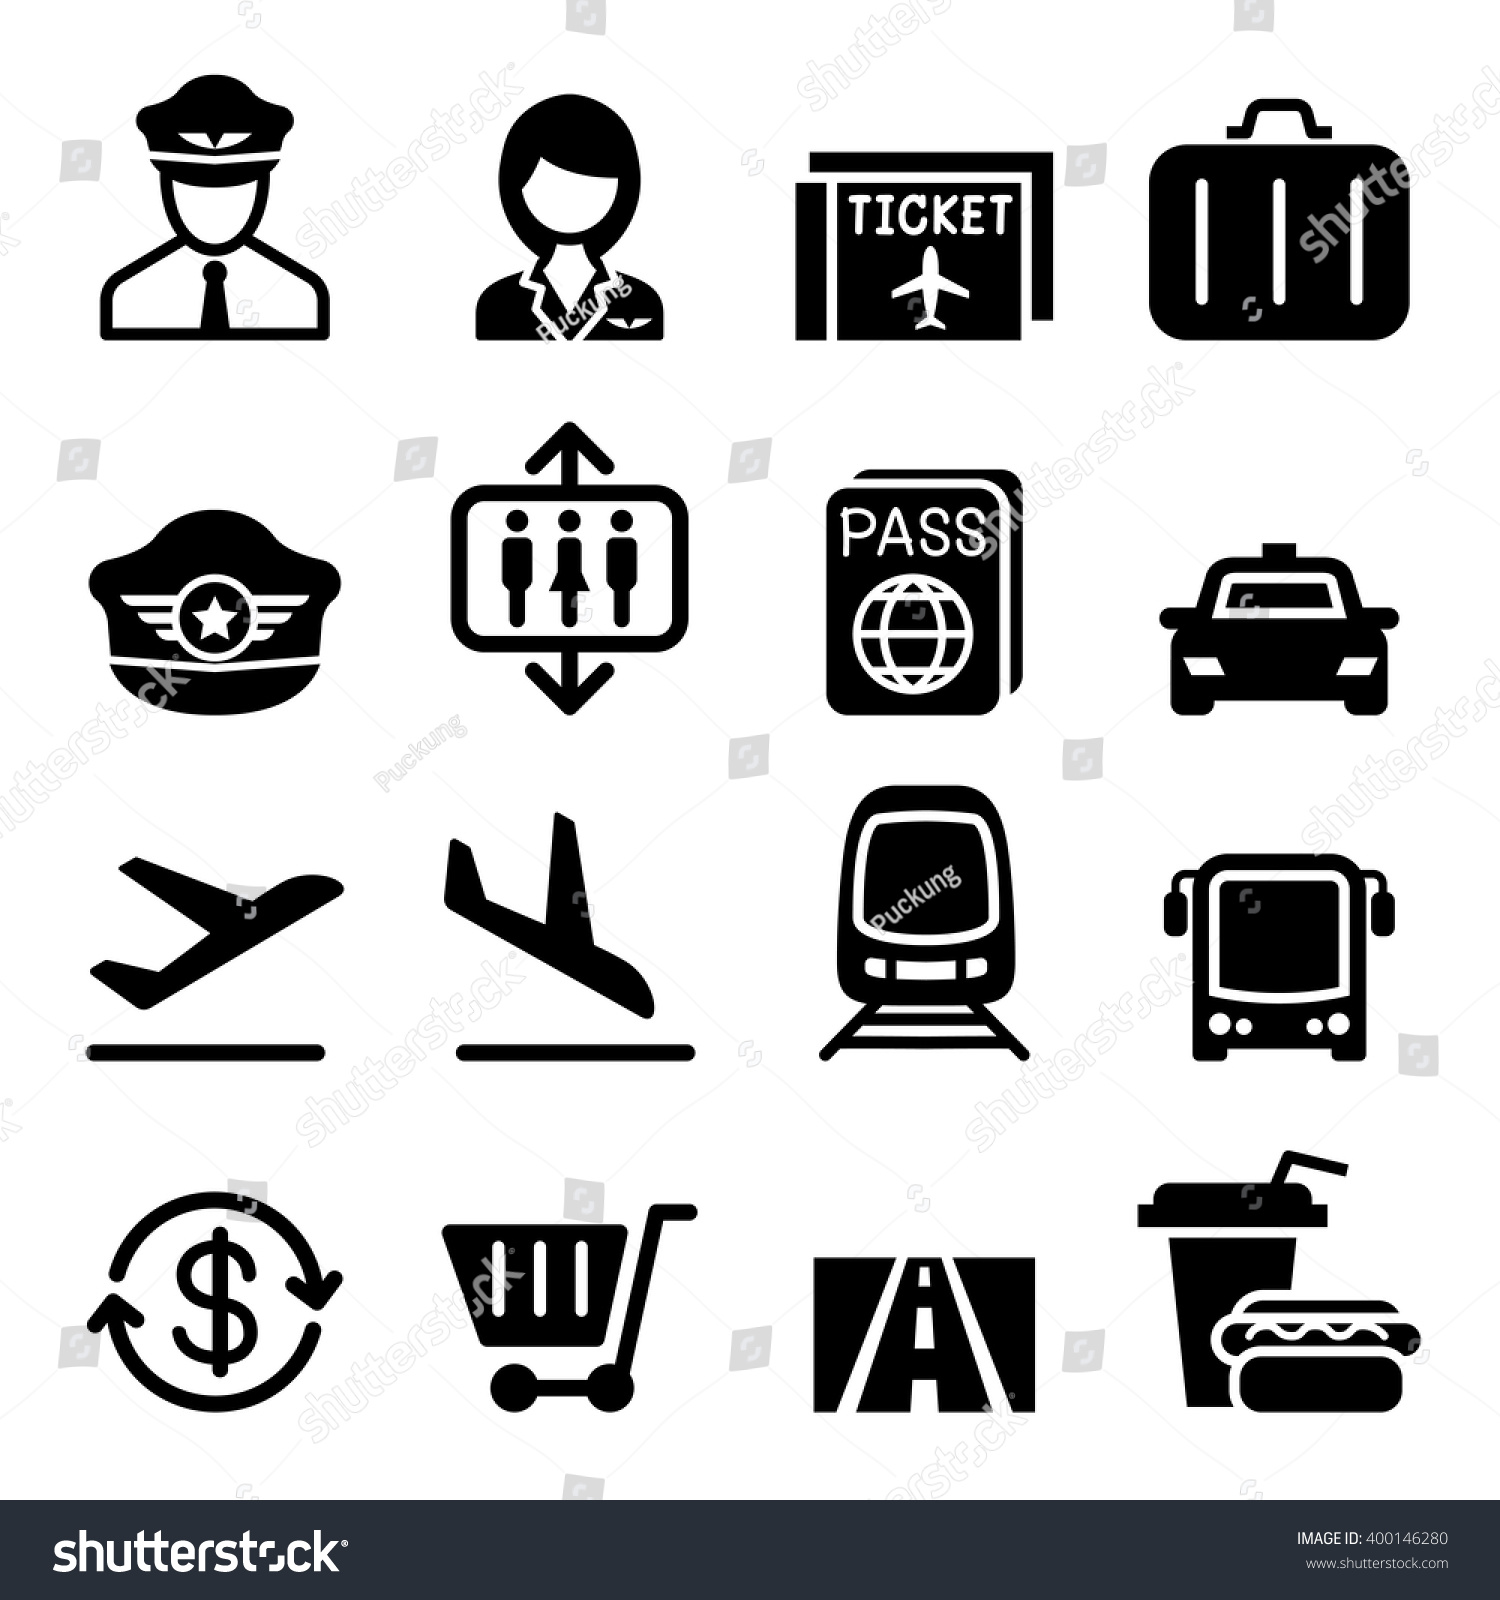 AirNav: Airport Search